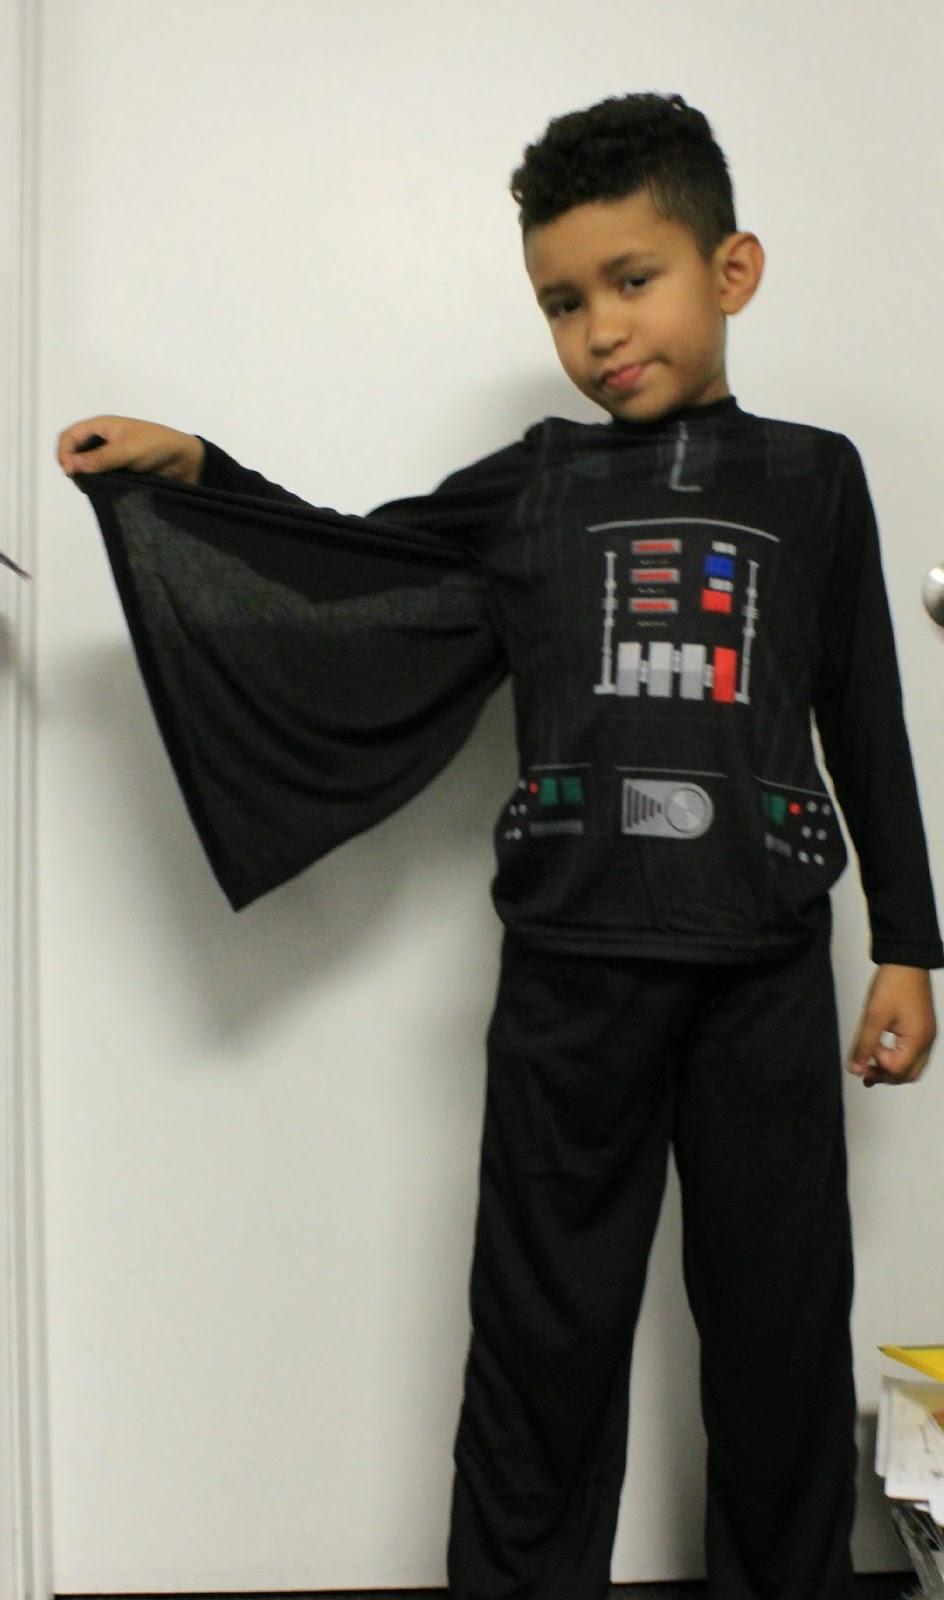 Youth Darth Vader sleep set! #SparkRebellion #shop